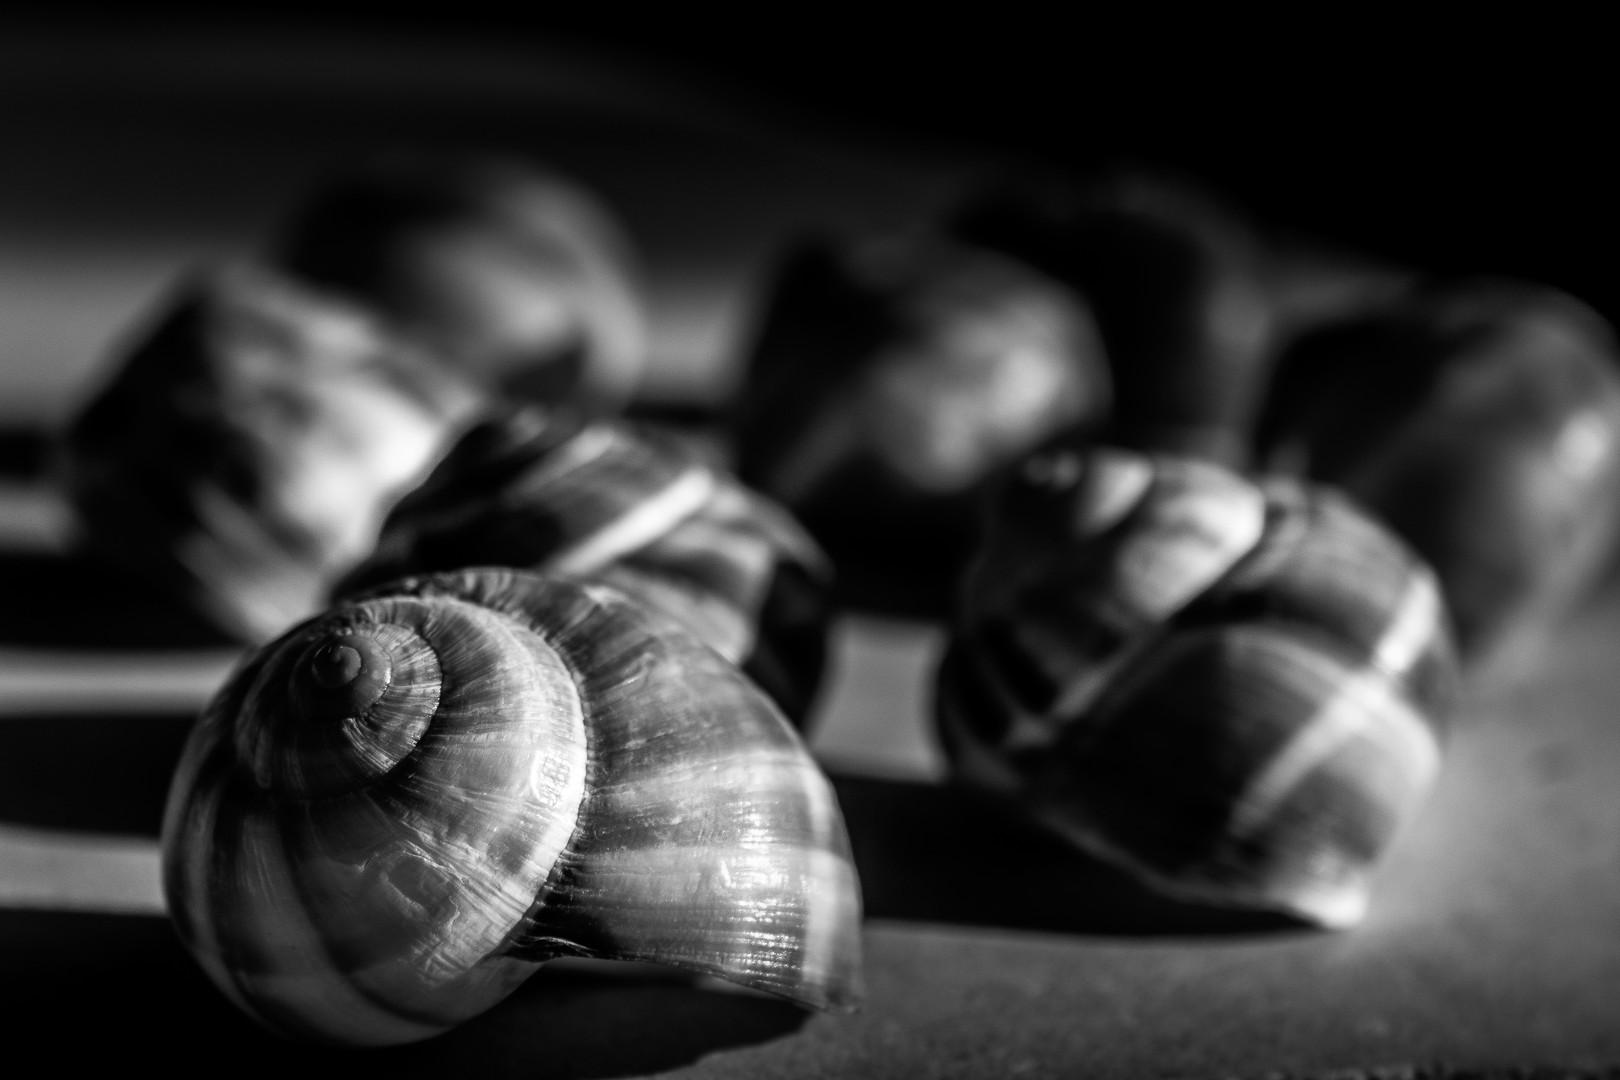 Shells_9949.jpg